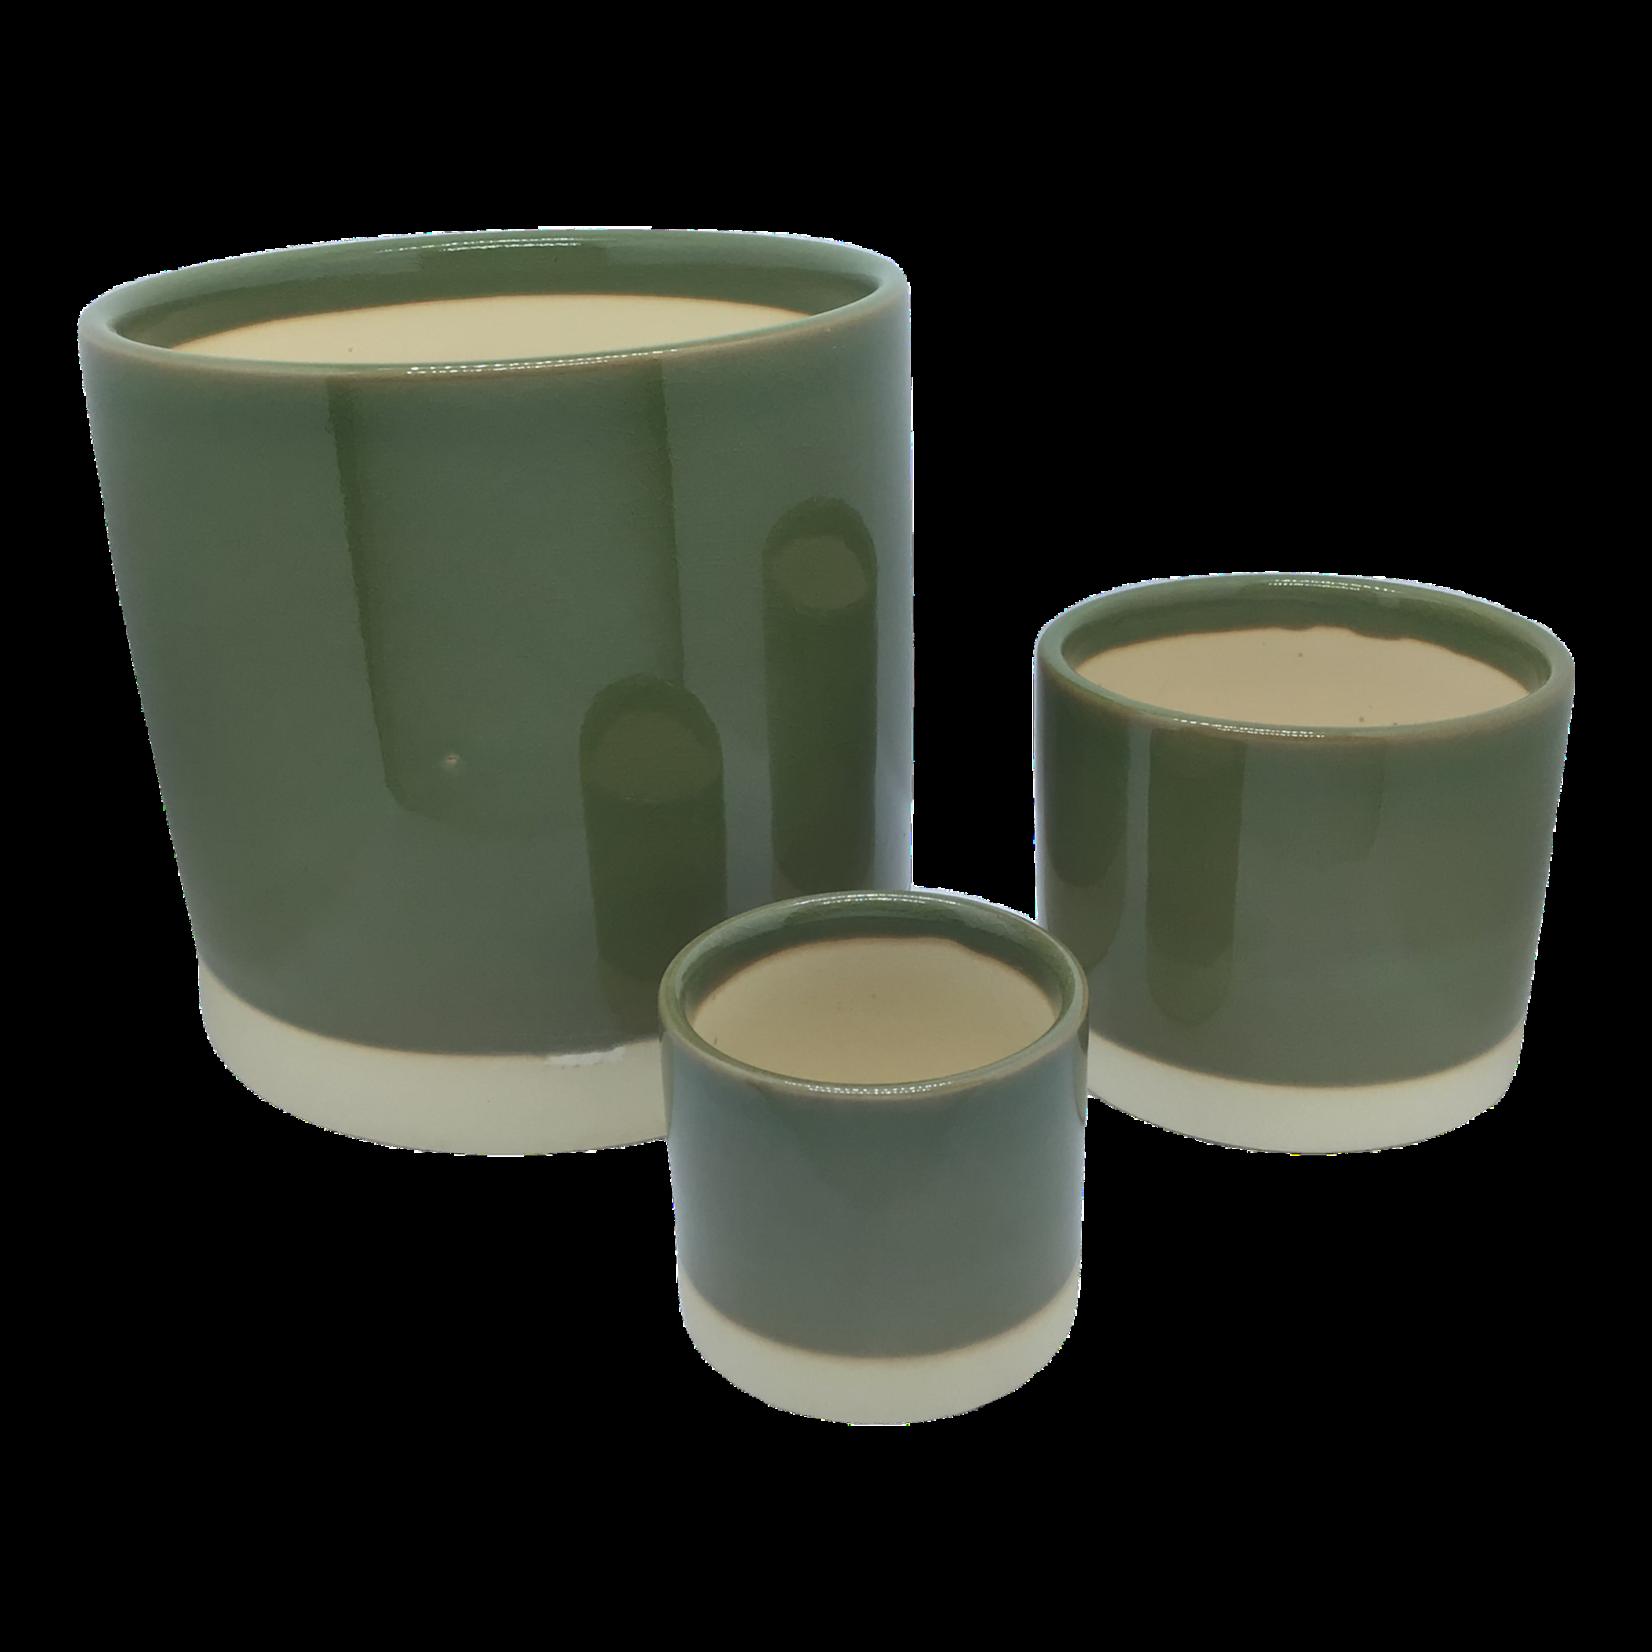 NLS Cache pot cér. Vert olive